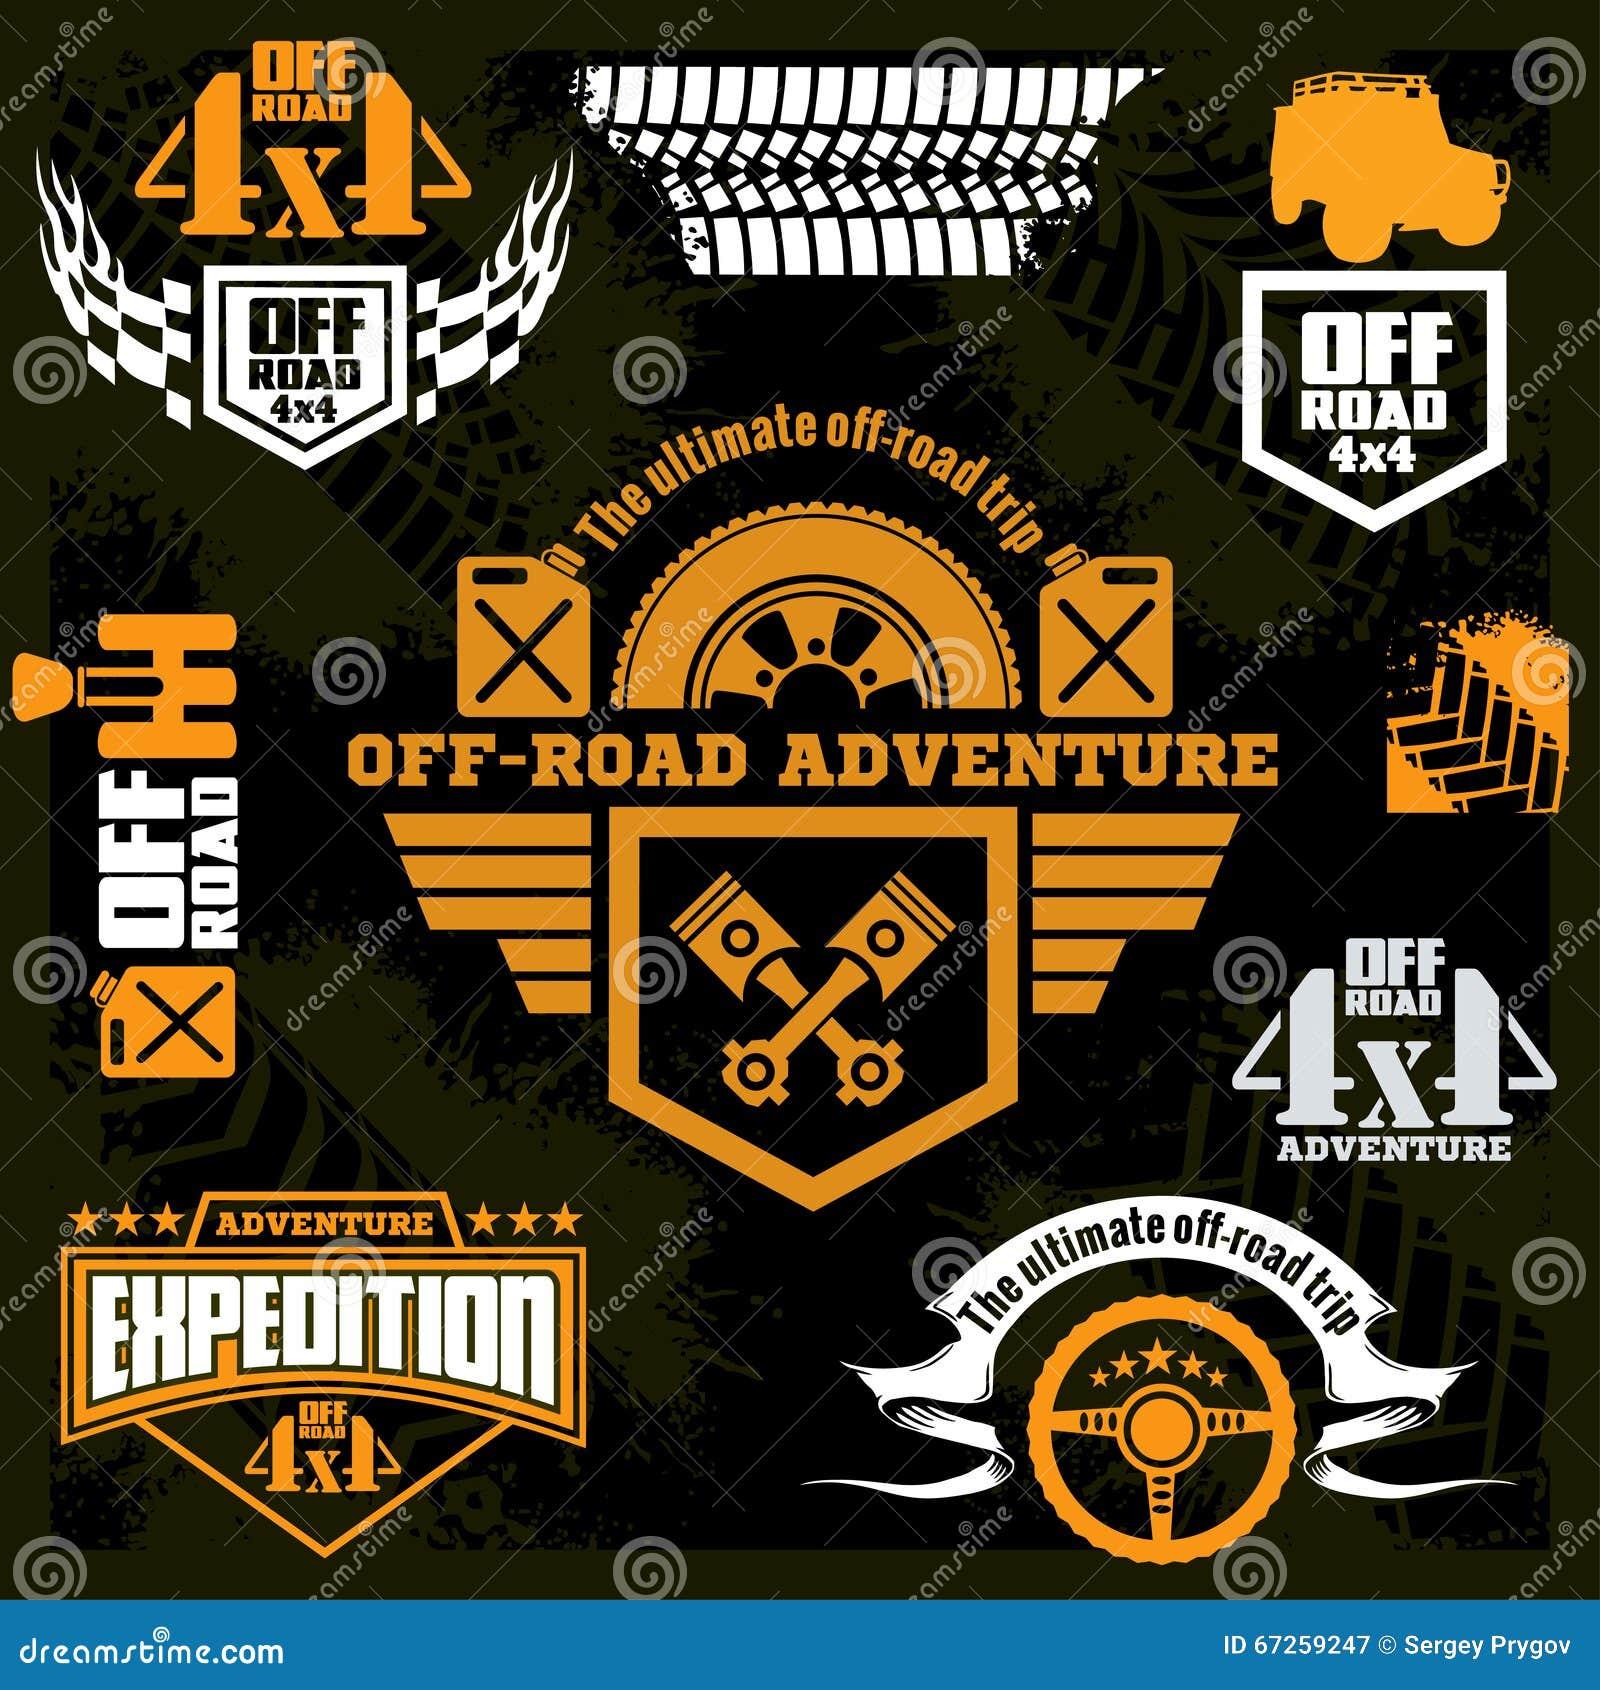 Design car club logo - Set Off Road Suv Car Emblems Design Elements Badges And Icons